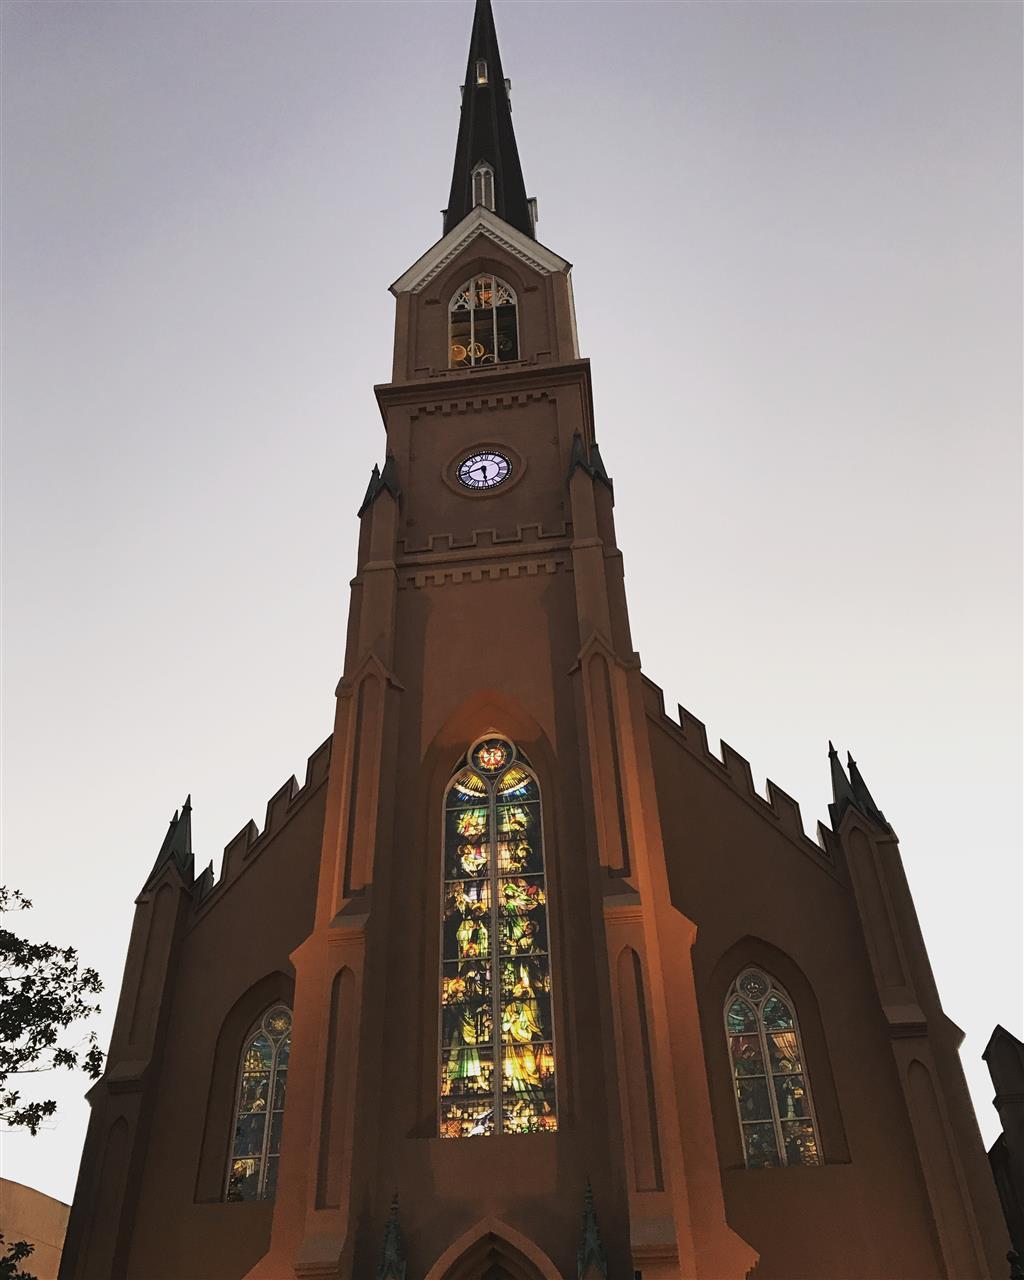 Cathedral of St. John the Baptist Harleston Village Charleston, South Carolina